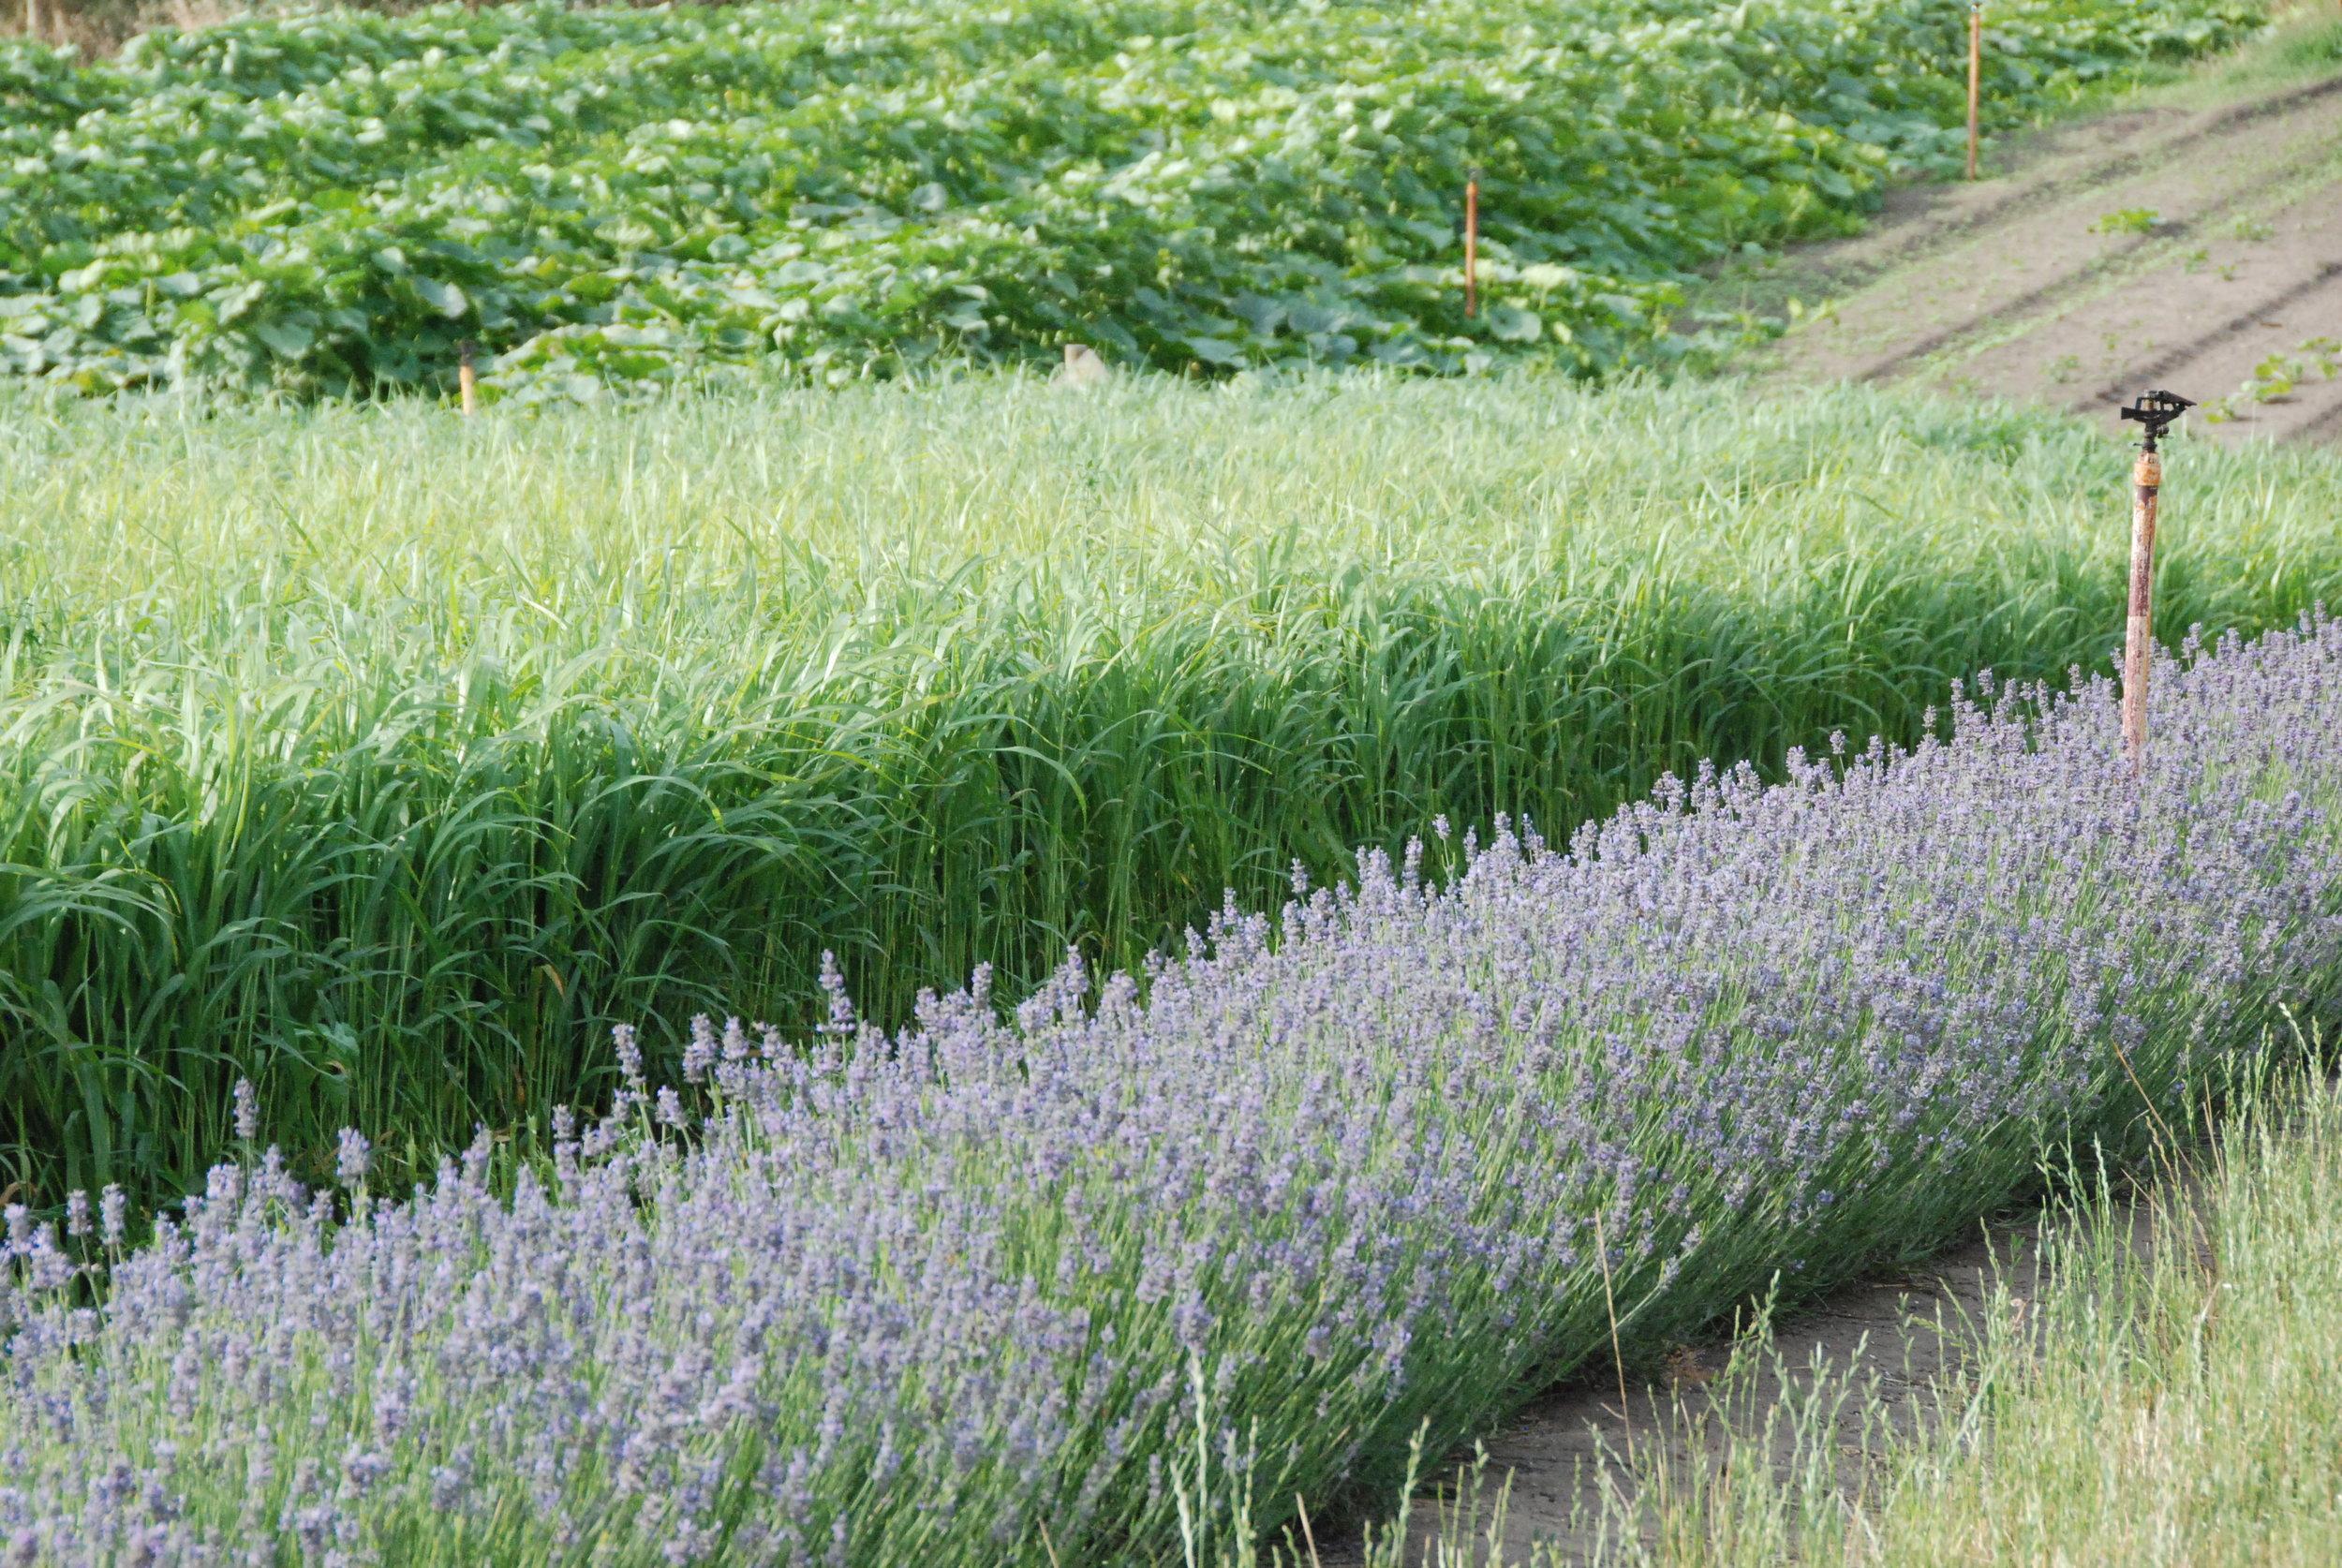 Lavender, green manure crop and pumpkins - DECEMBER 2017